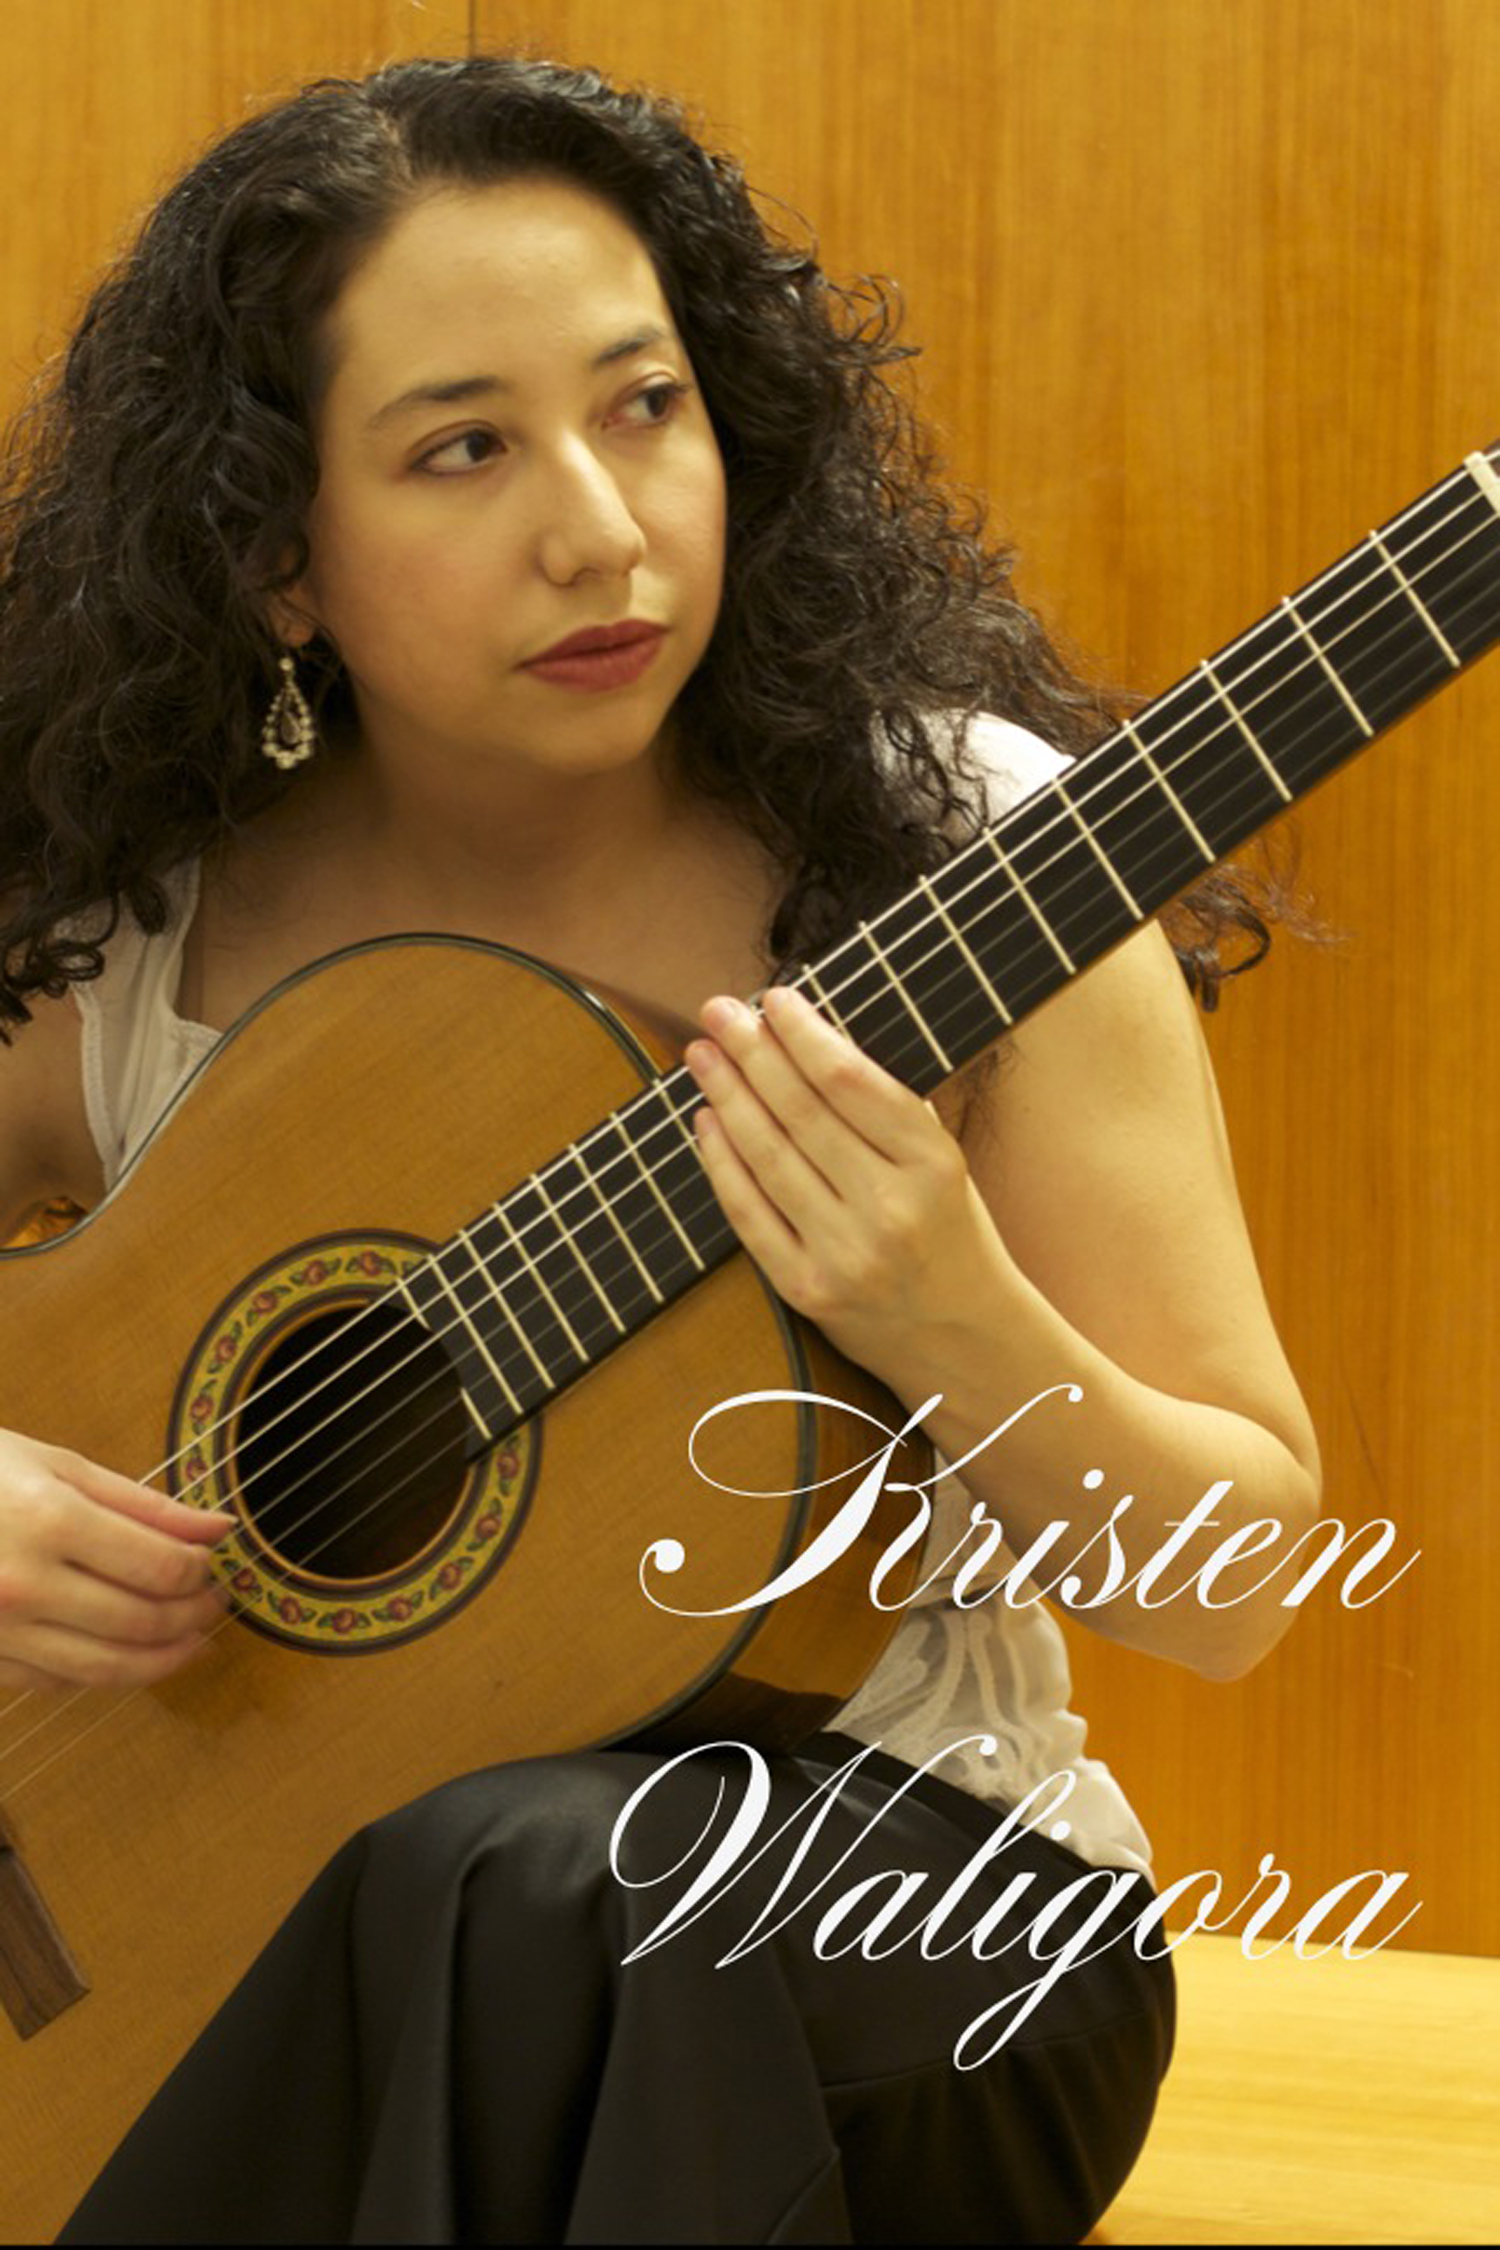 duo_tenebroso_kristen_waligora_classical_guitar_formal.jpg